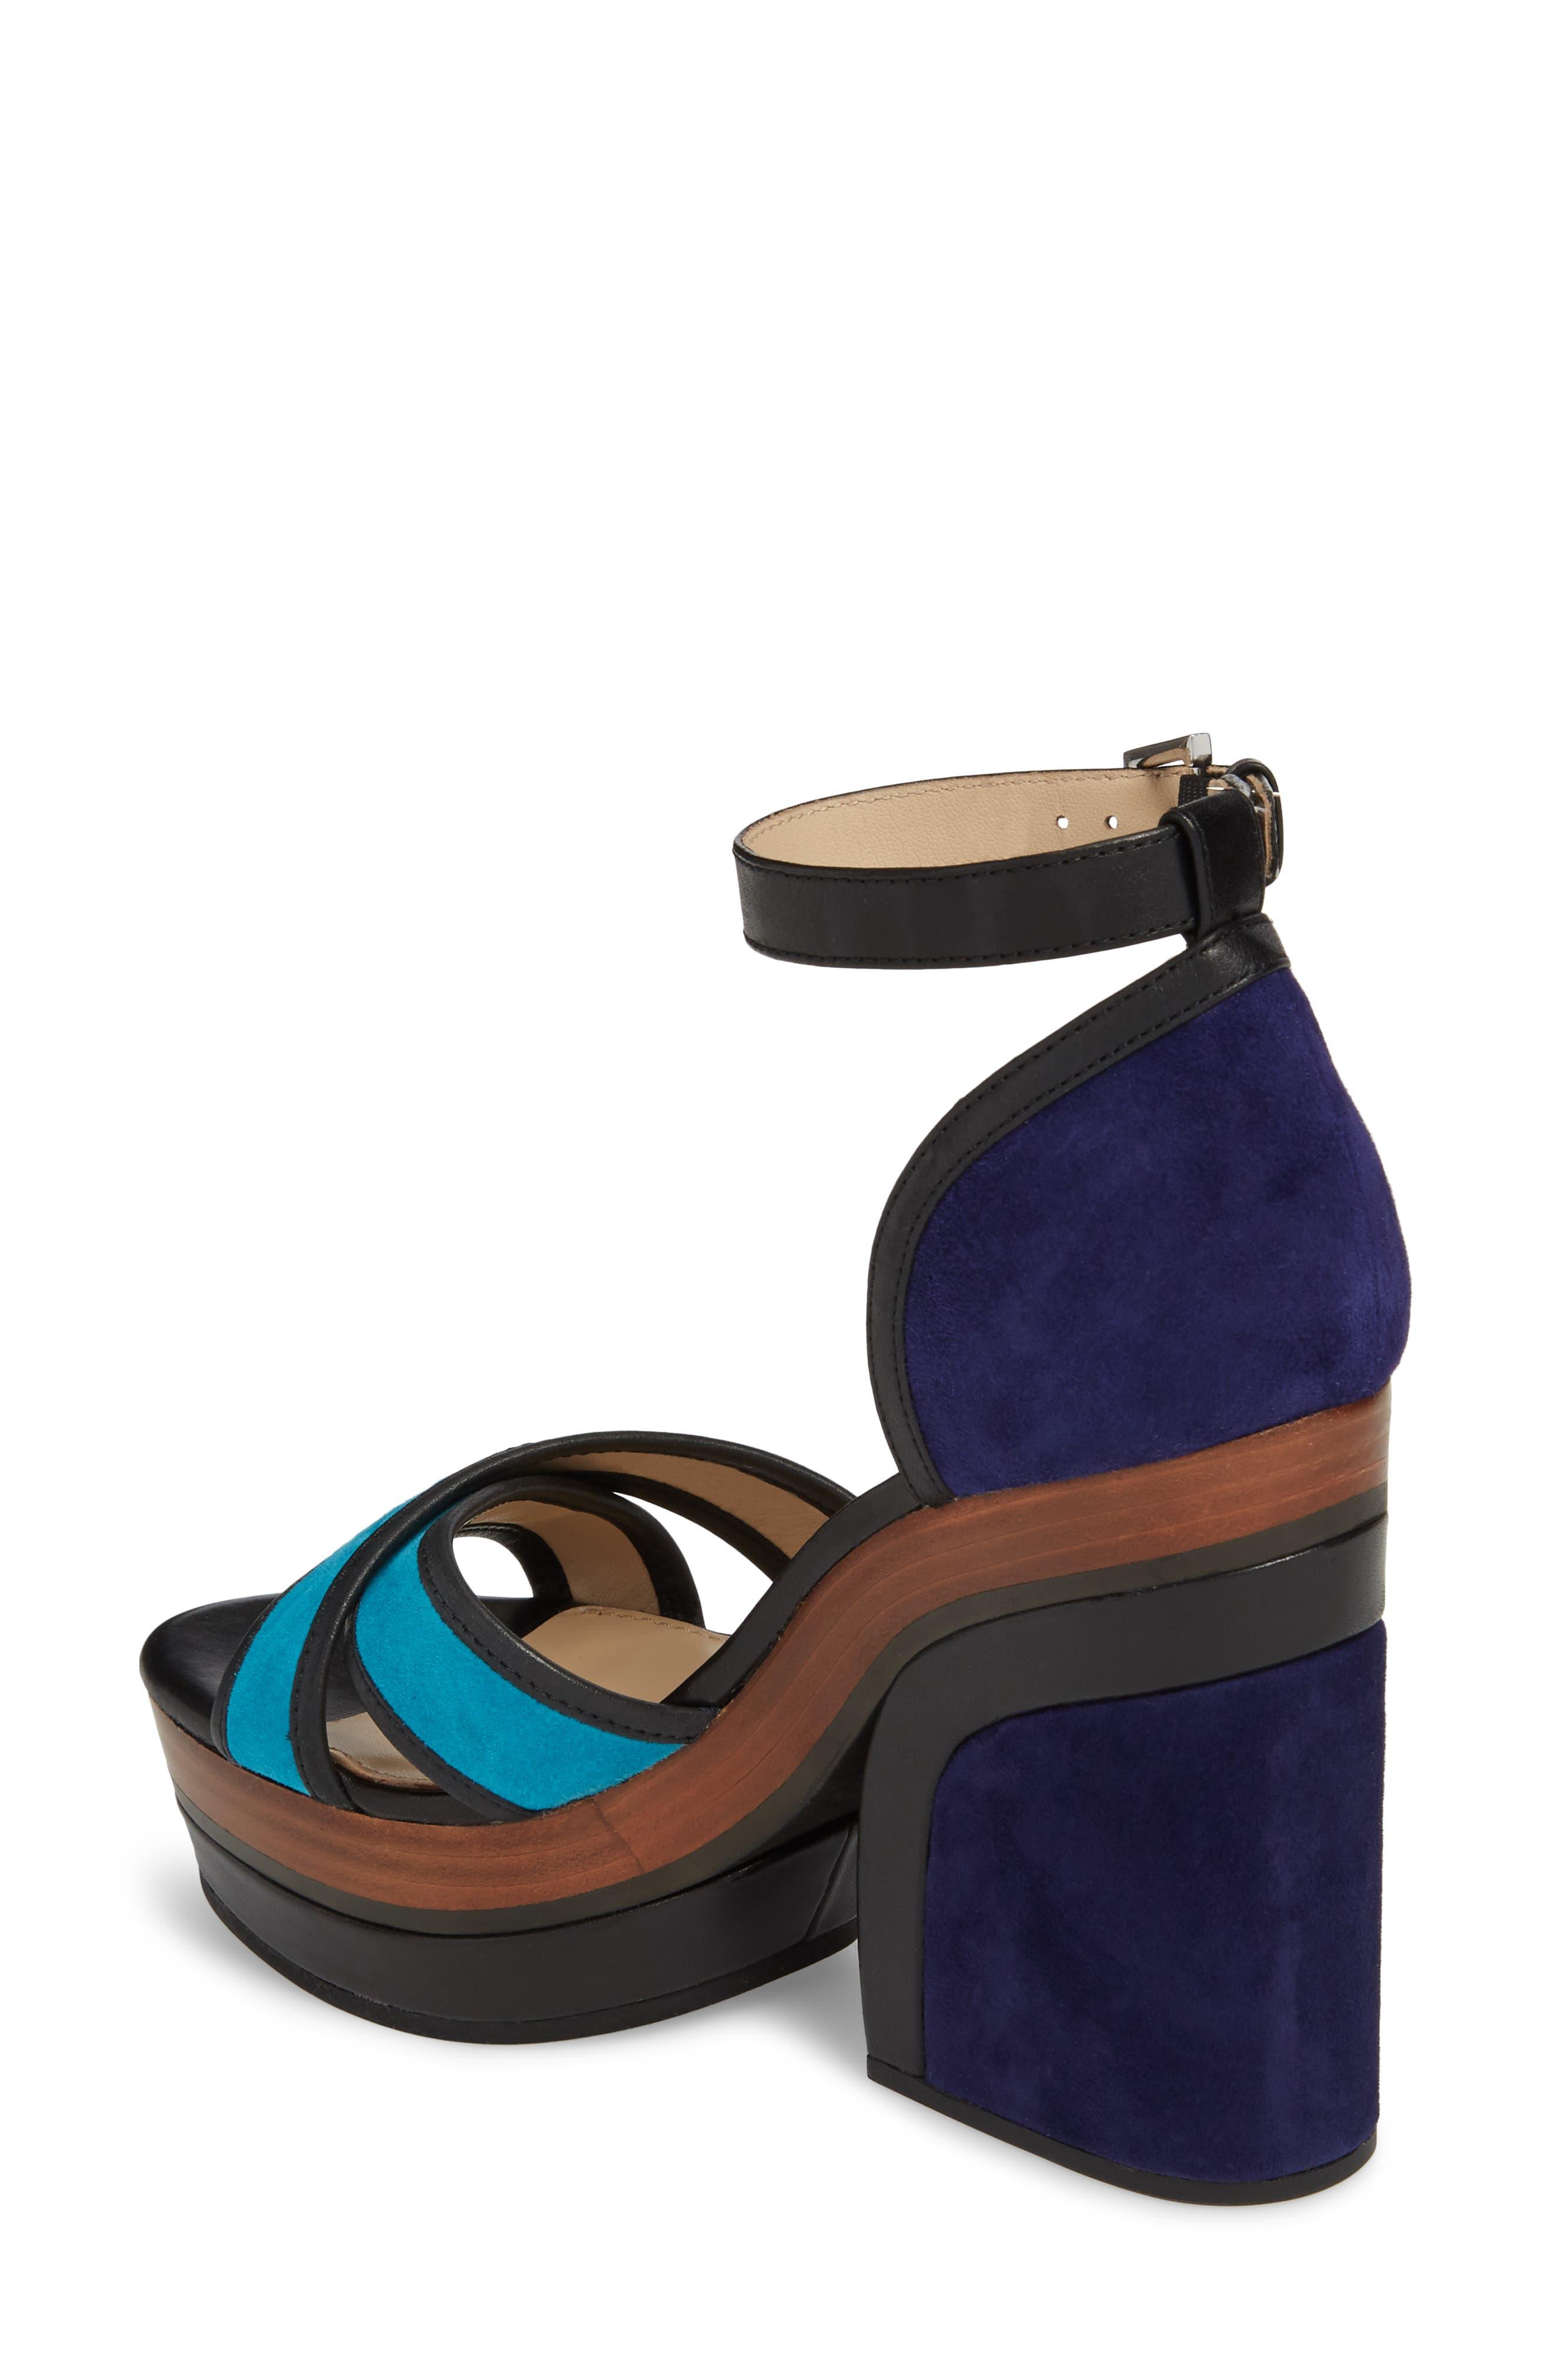 Paloma Ankle Strap Sandal,                             Alternate thumbnail 2, color,                             Ultra Marine Suede